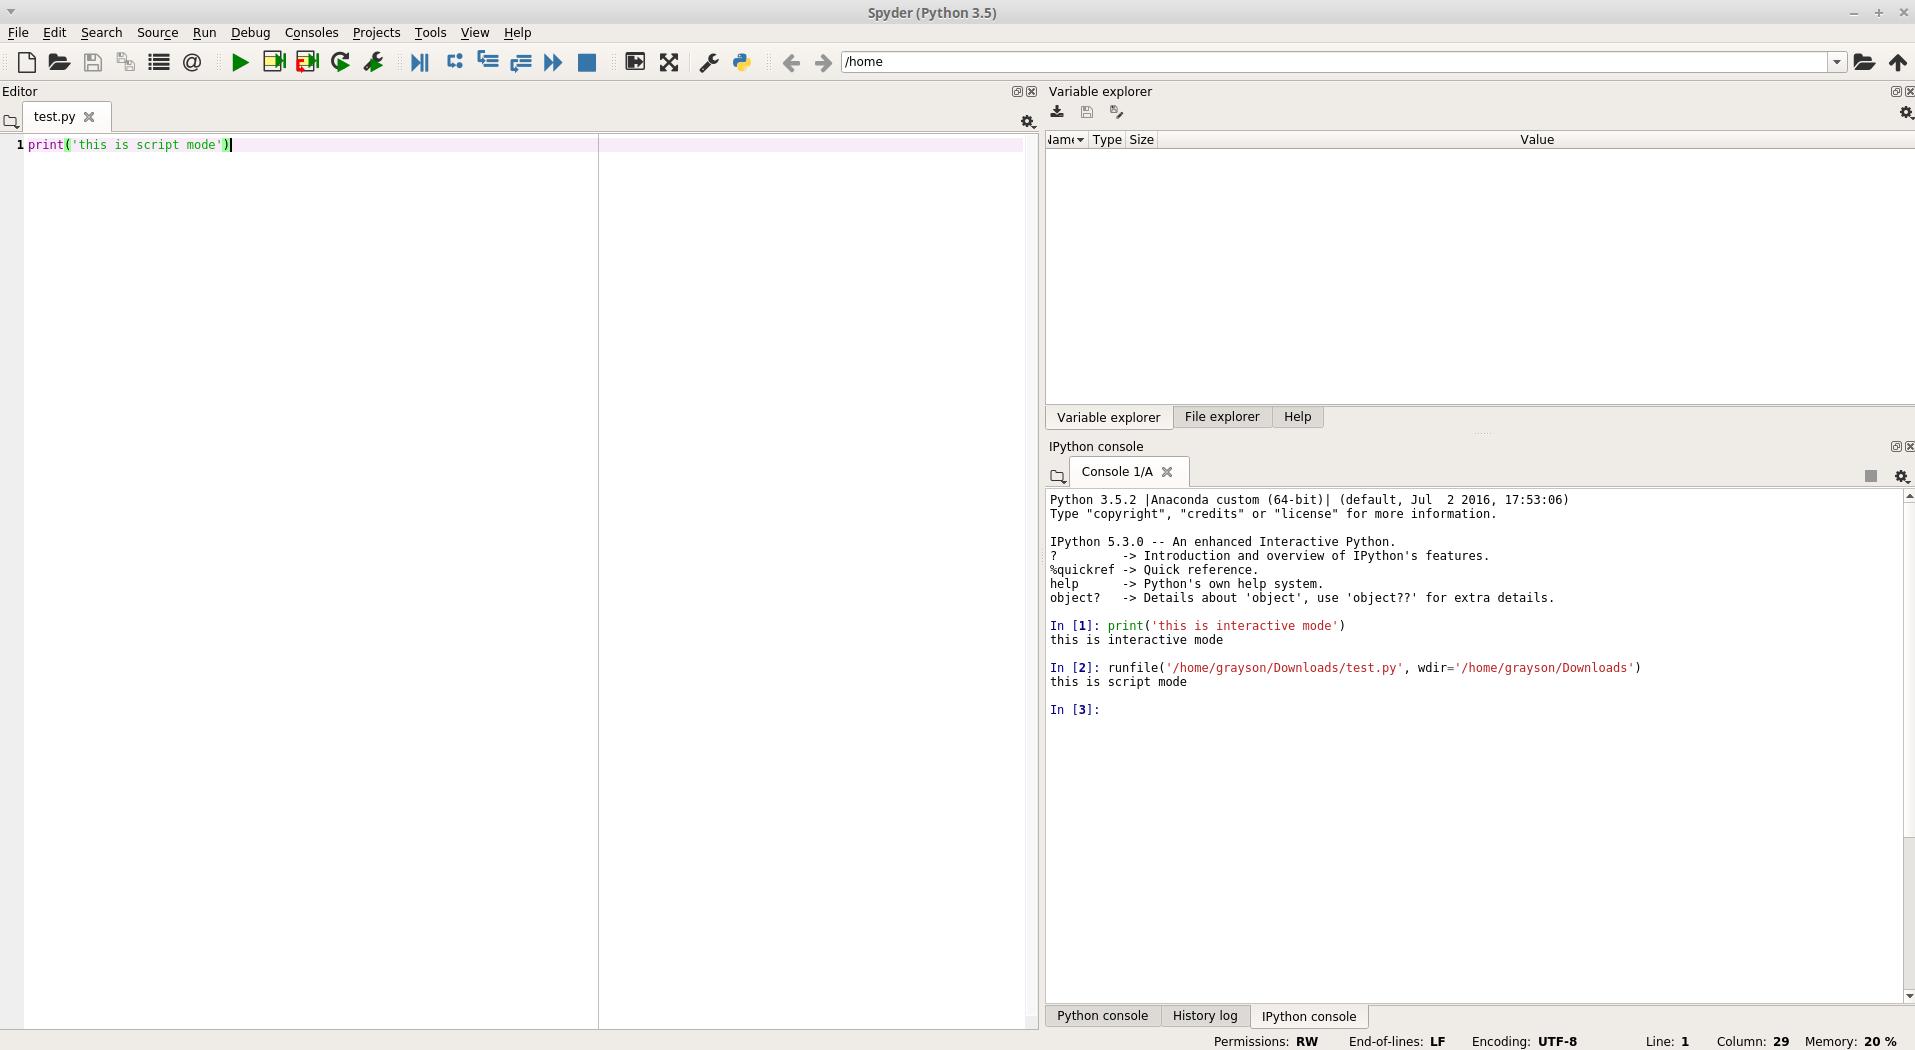 script mode example spyder